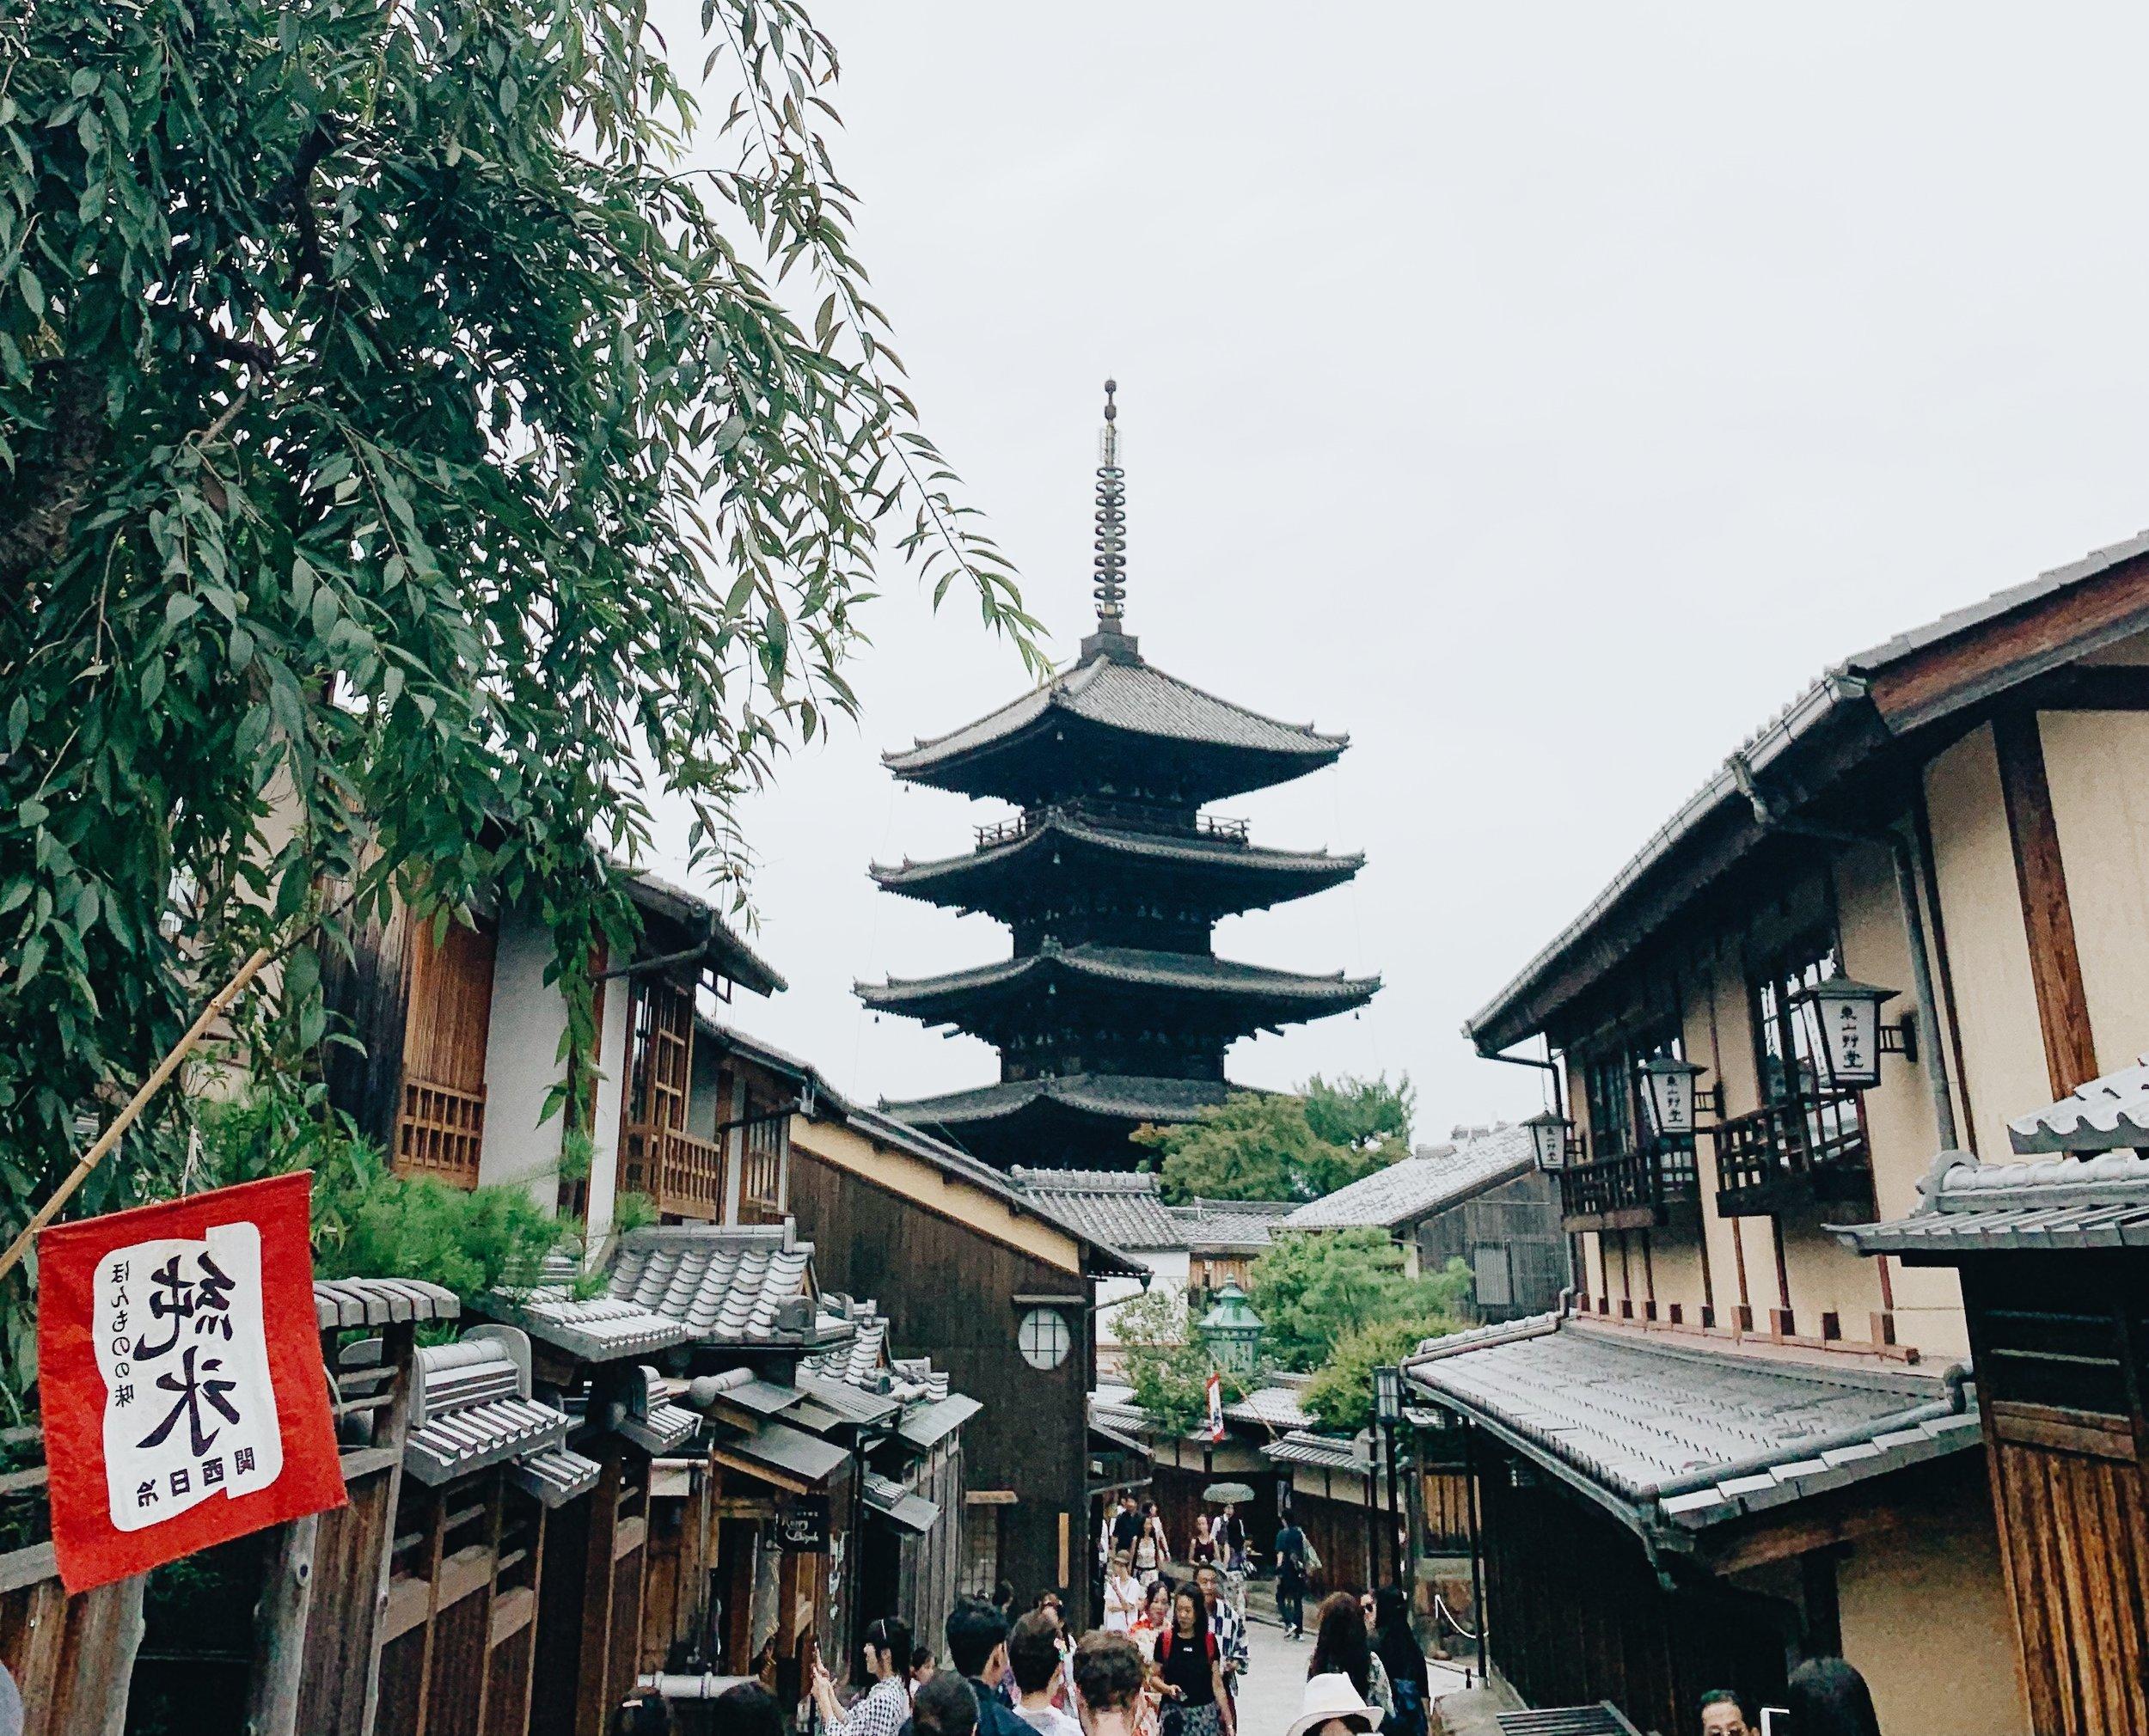 View of Yasaka shrine from Ninenzaka street